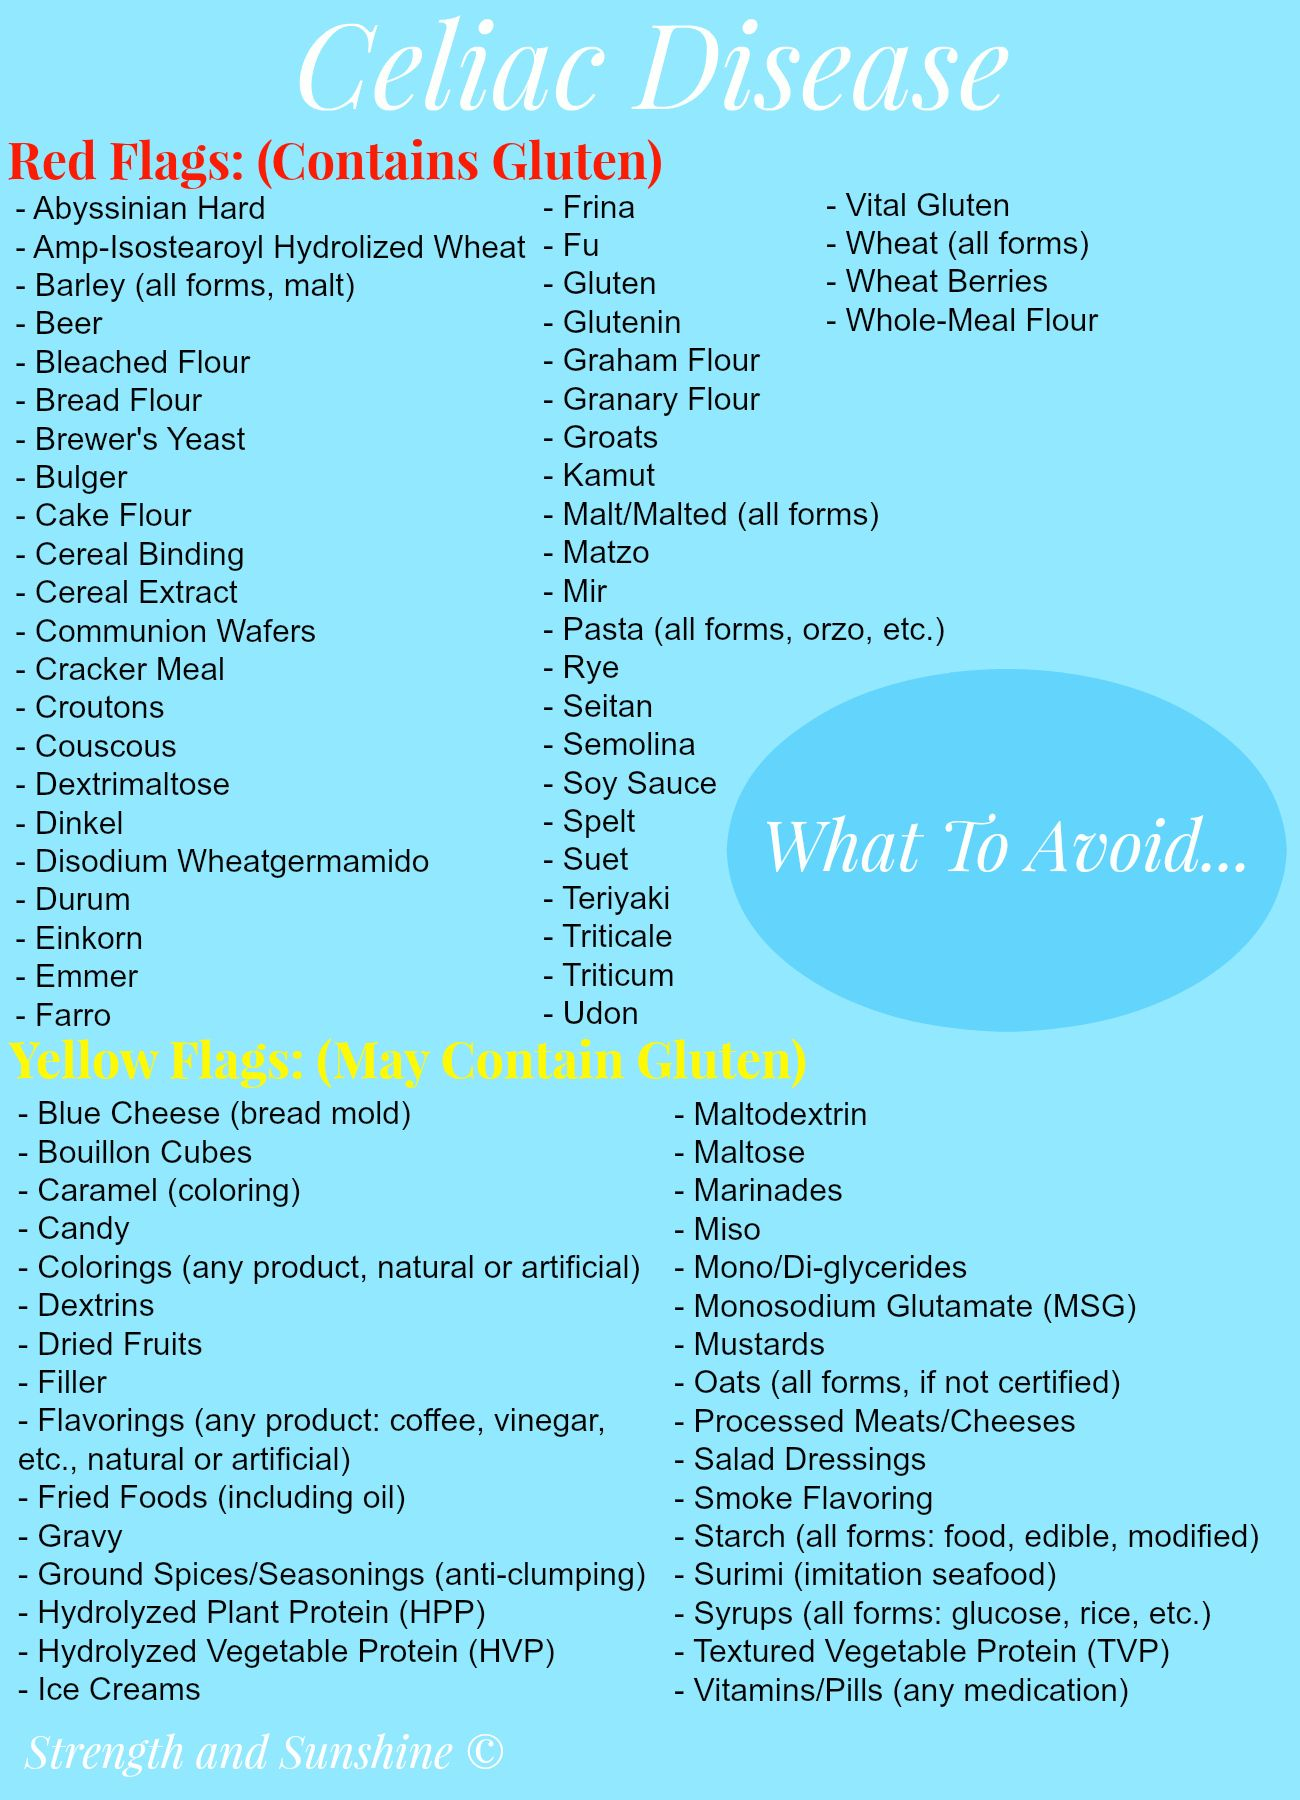 Celiac Disease Diet: Foods, Tips & Products to Avoid